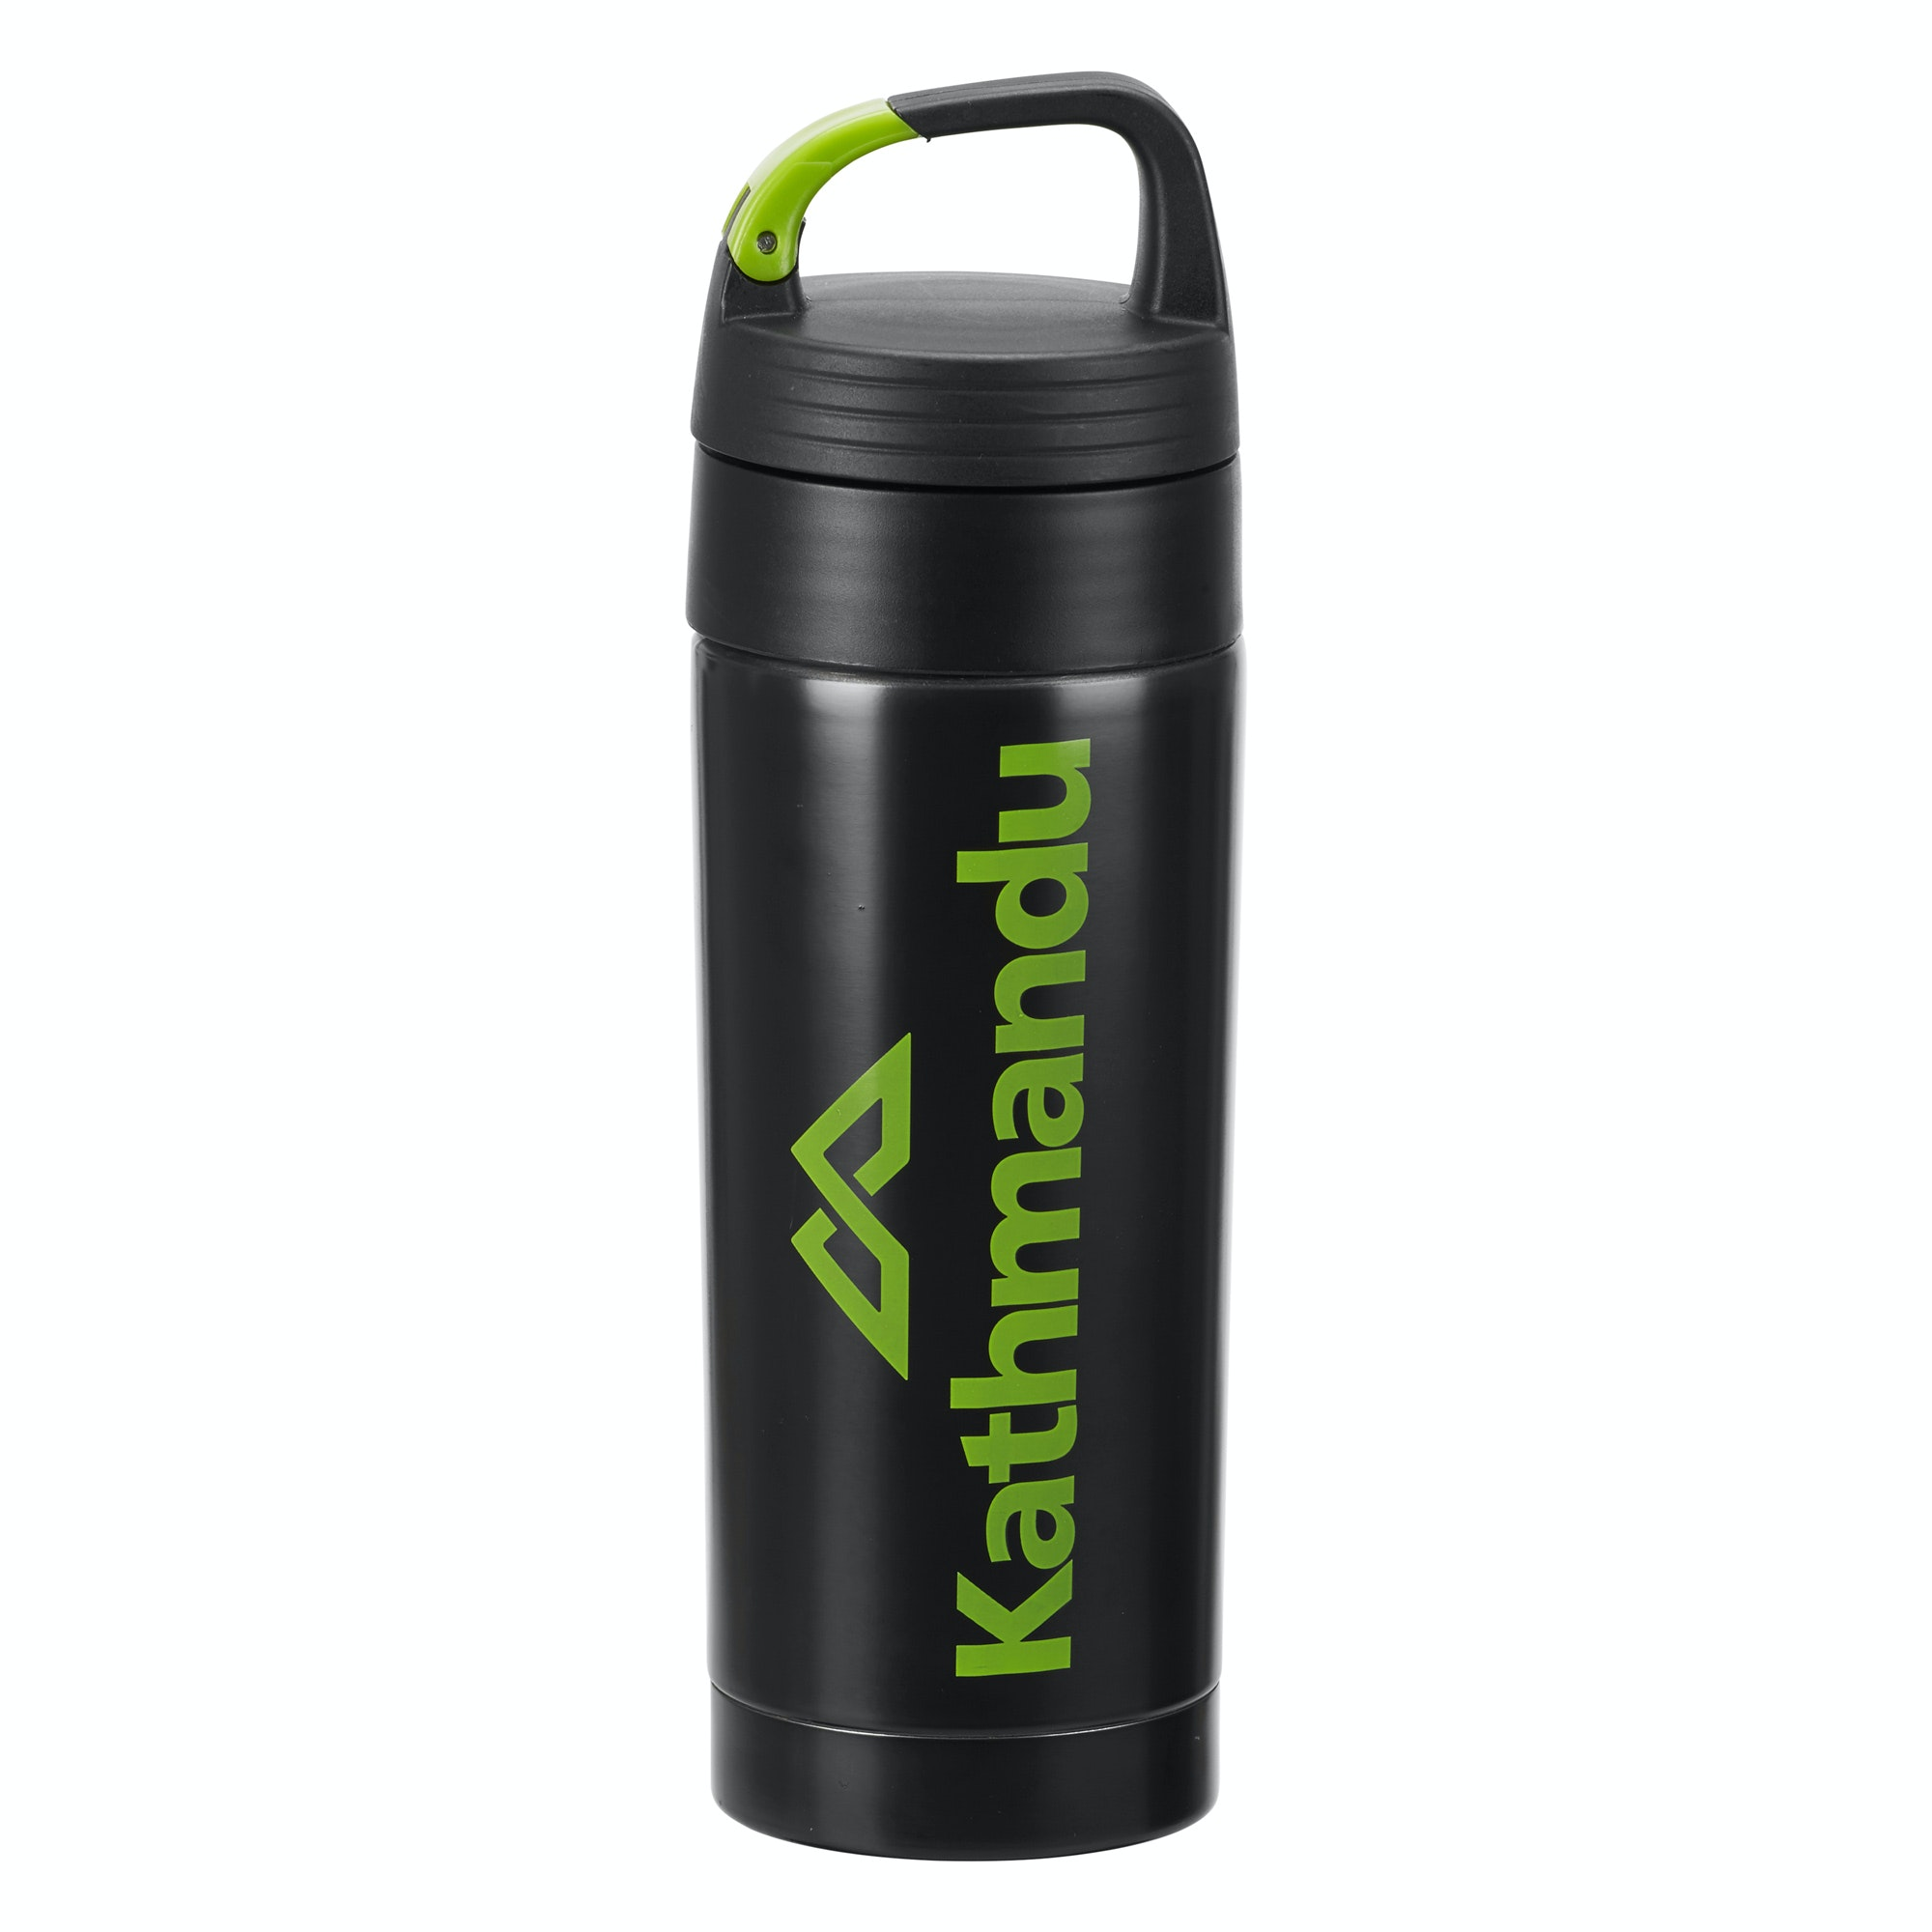 Kathmandu Vacuum Insulated Drink Bottle